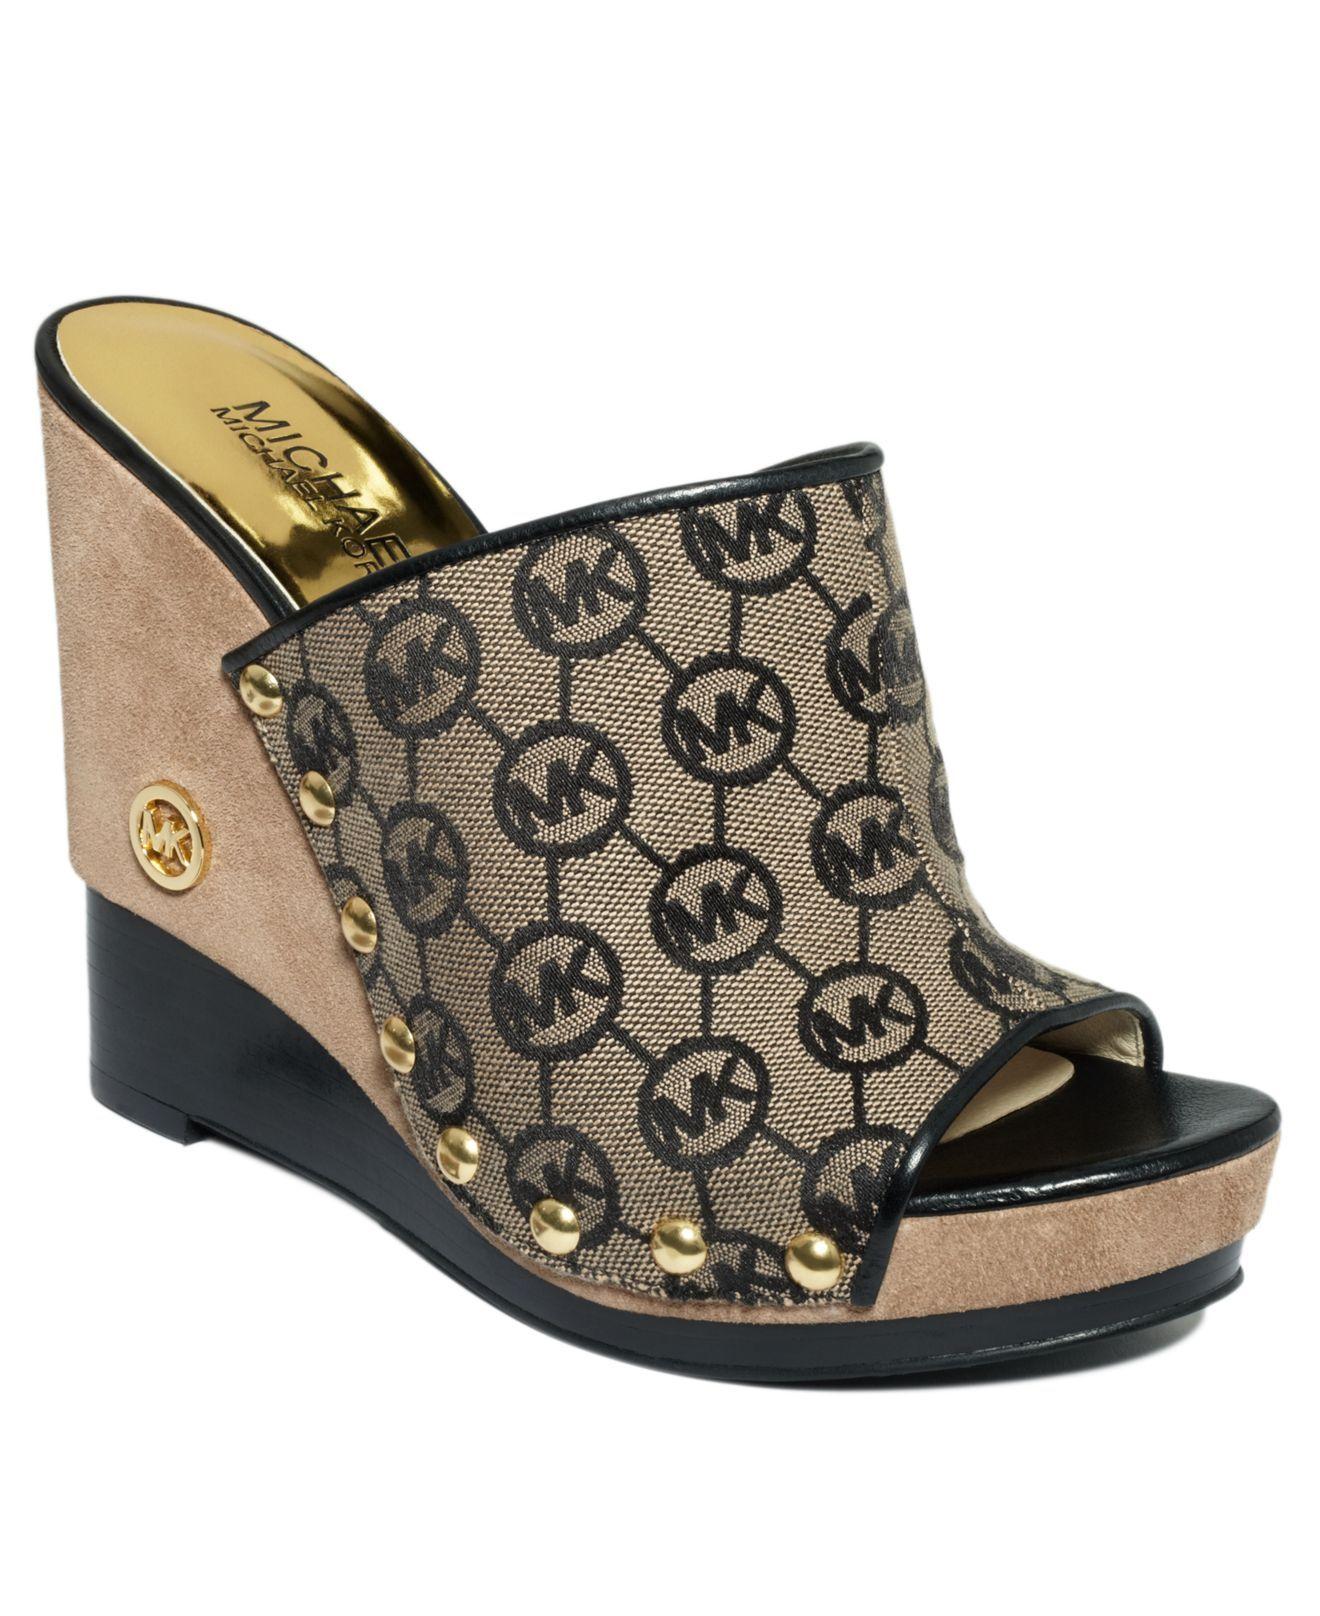 ac5c40635b93 MICHAEL Michael Kors Shoes